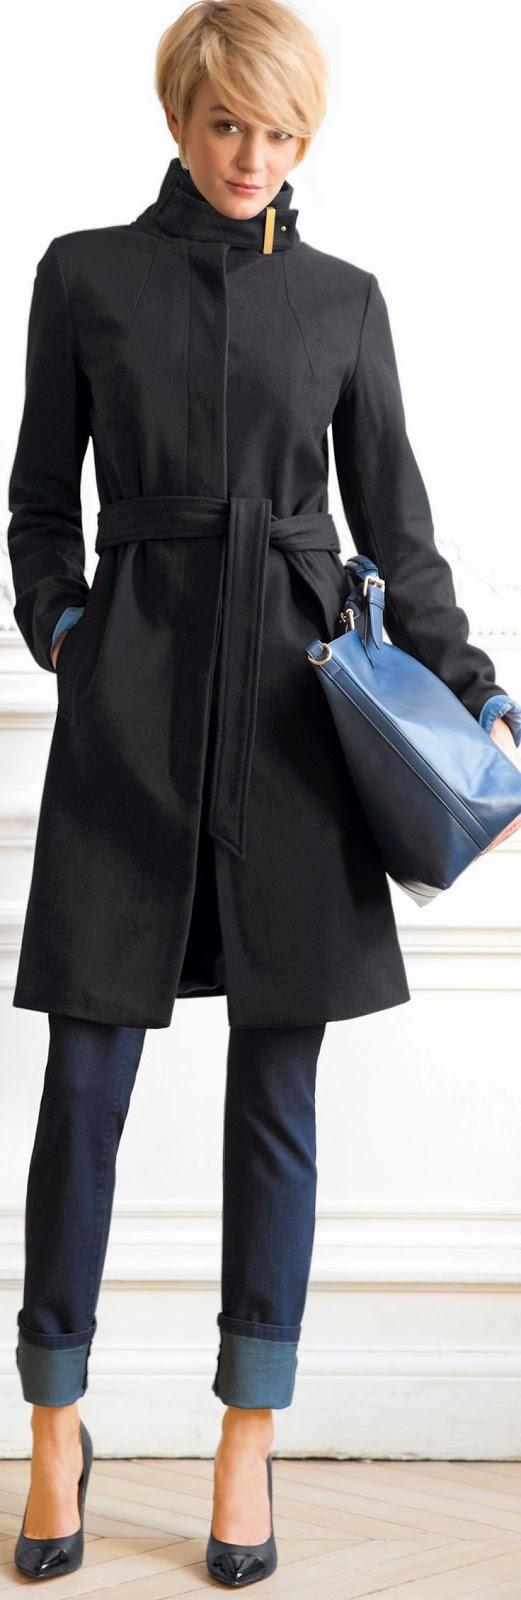 Women S Fashion Elegant Coat And Denim